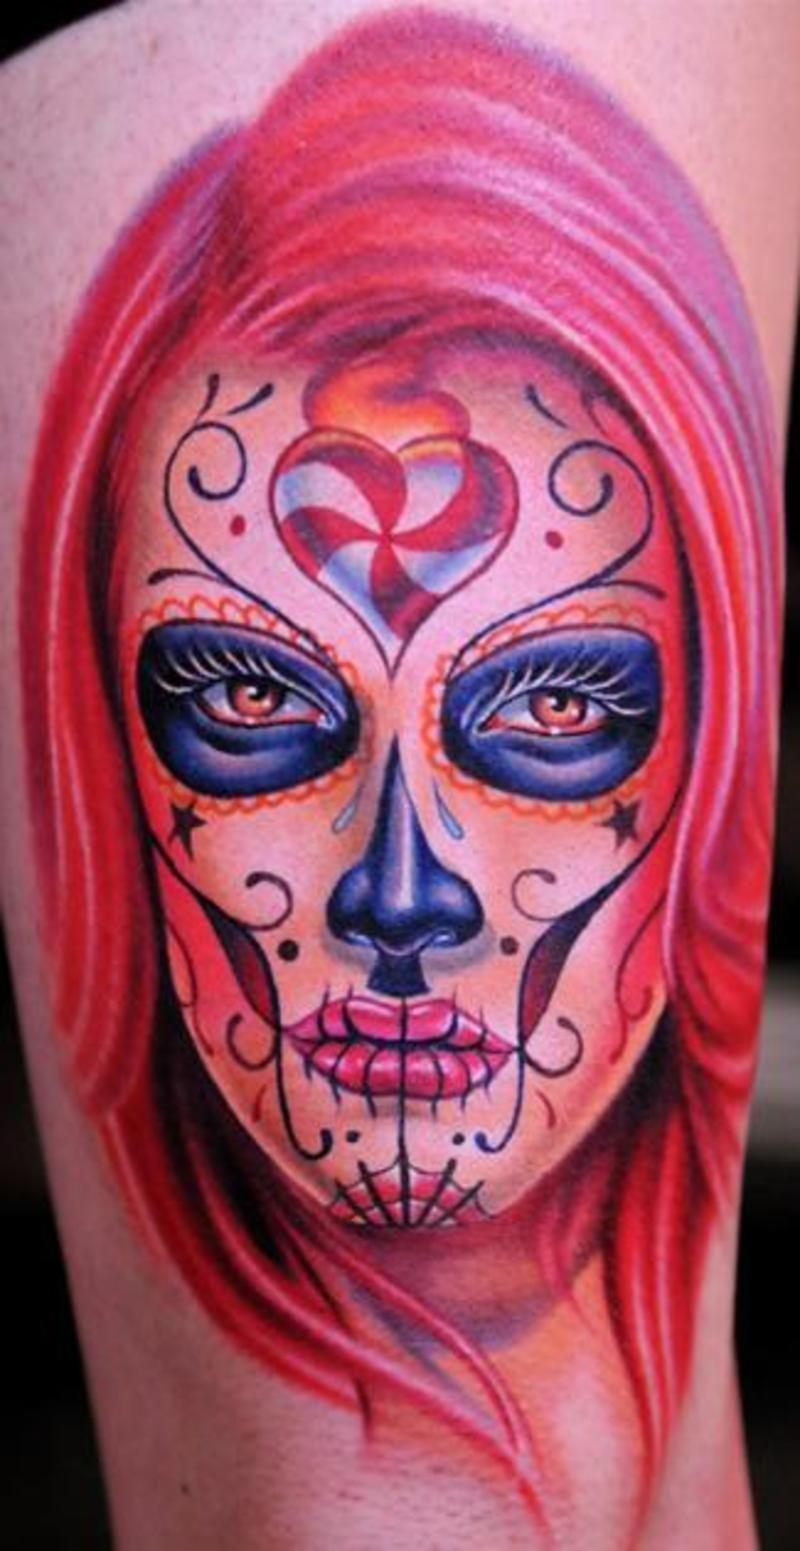 Dia de los muertos devil tattoo on half sleeve for Dia de muertos tattoos